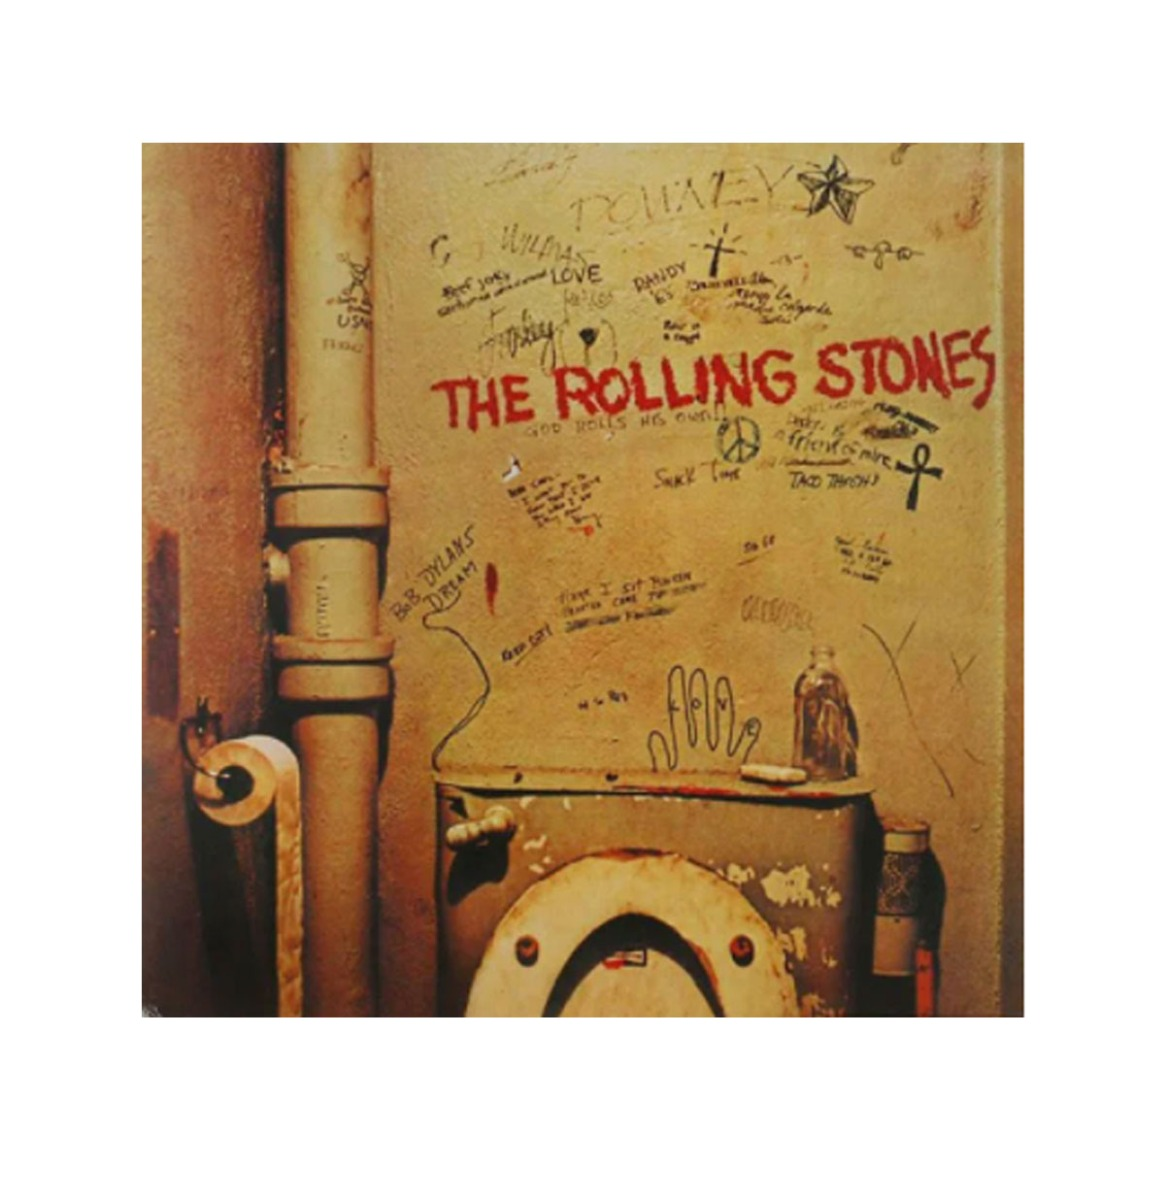 The Rolling Stones - Beggers Banquet LP